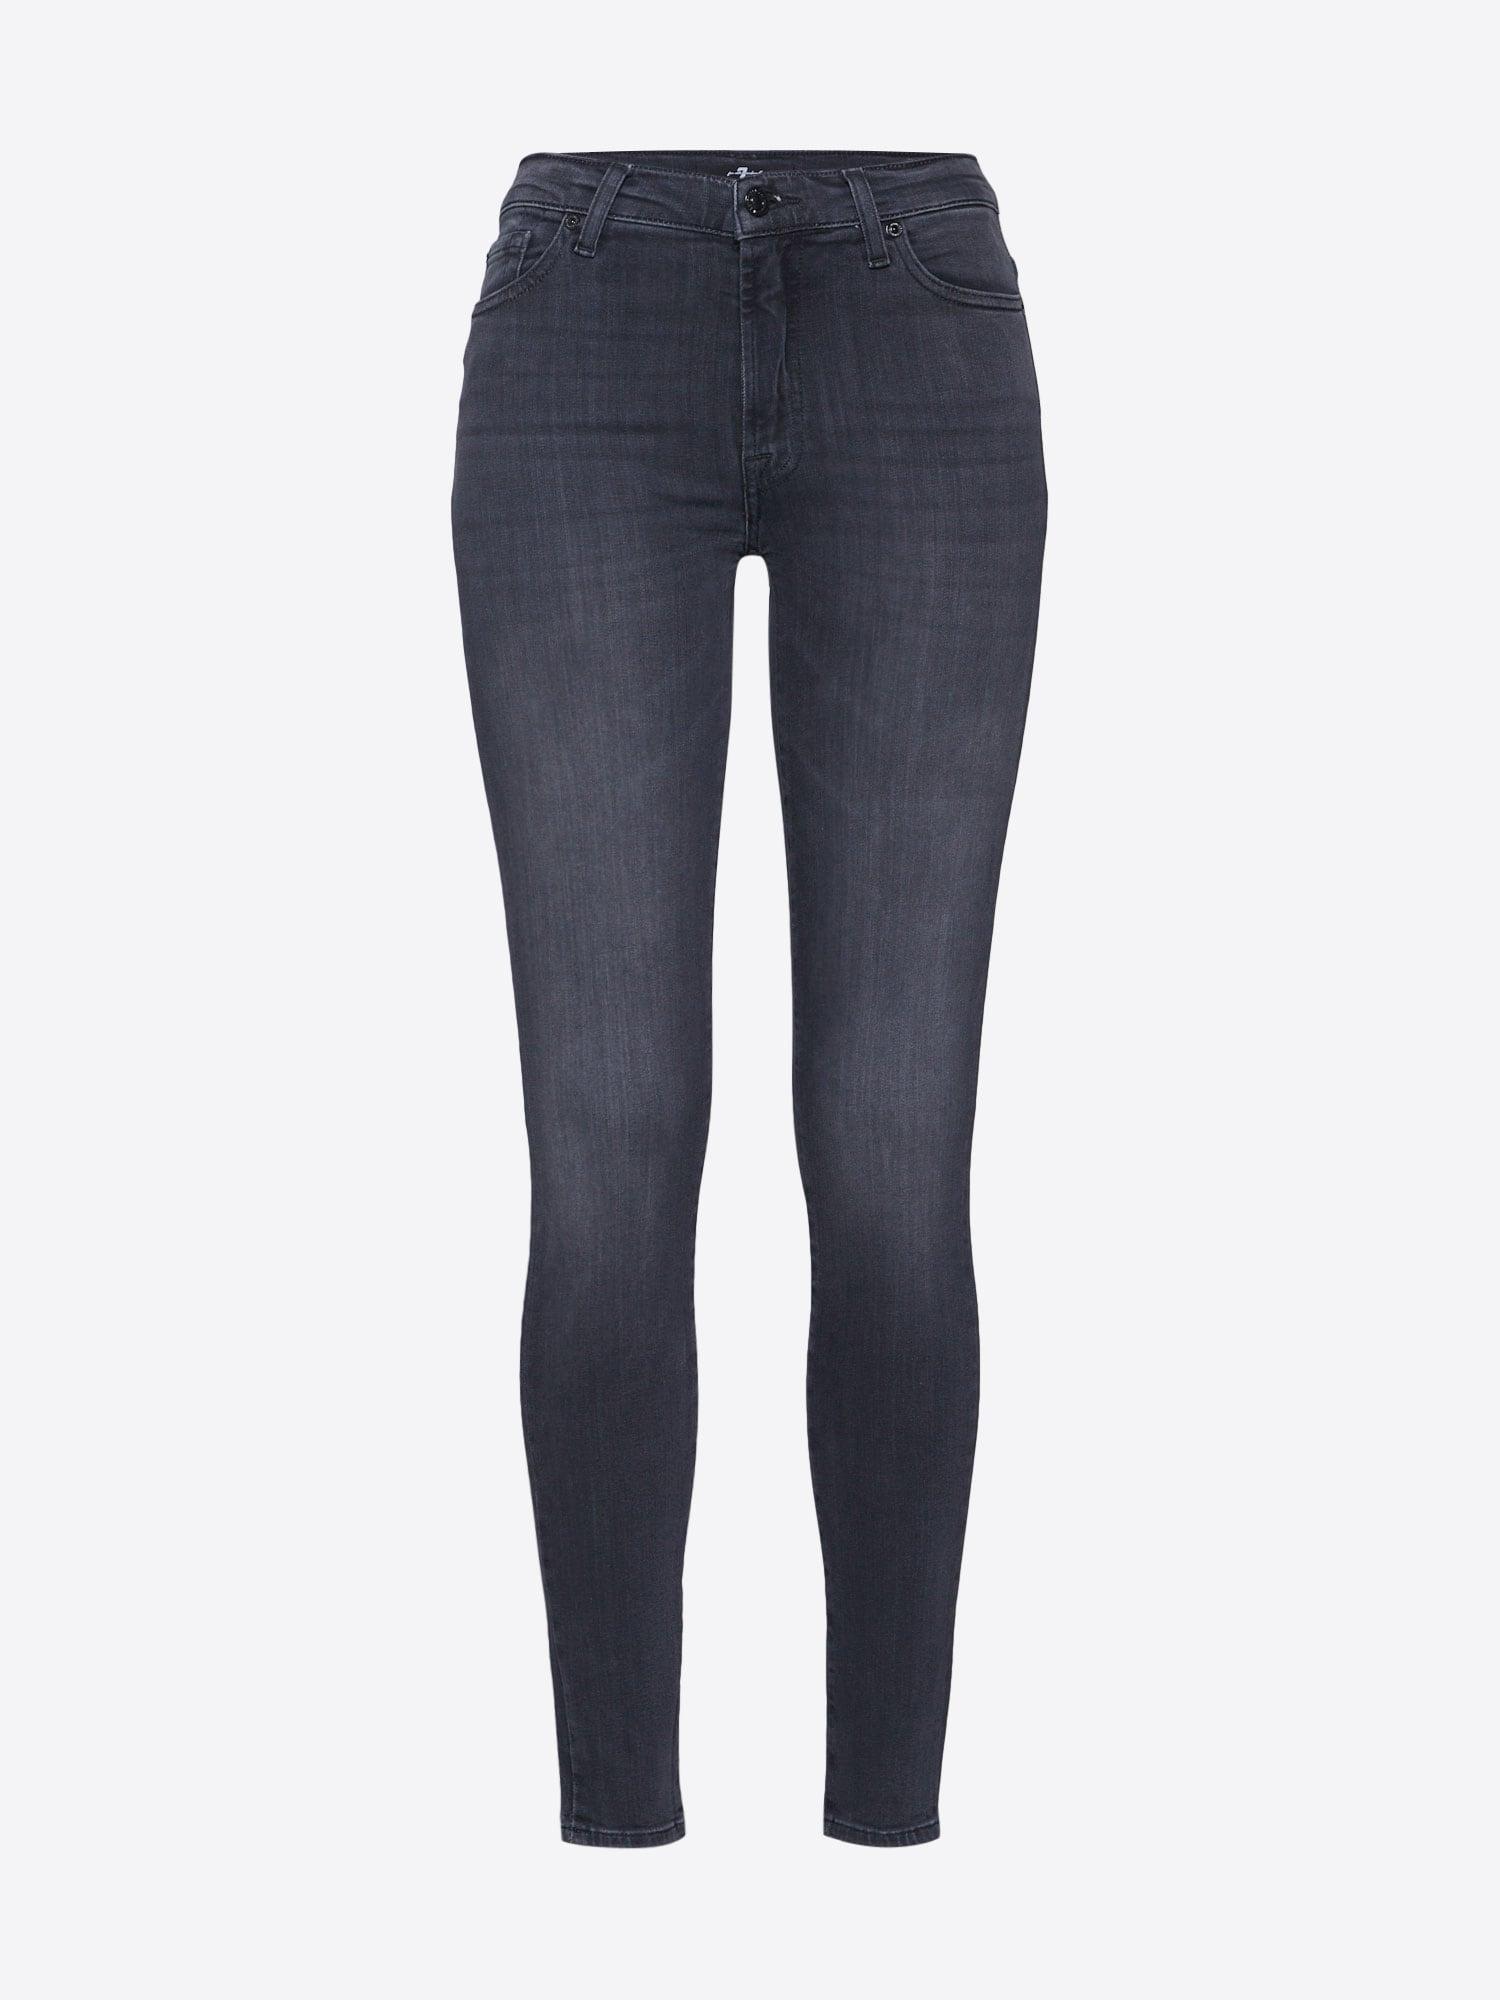 7 for all mankind Jeans  grå denim